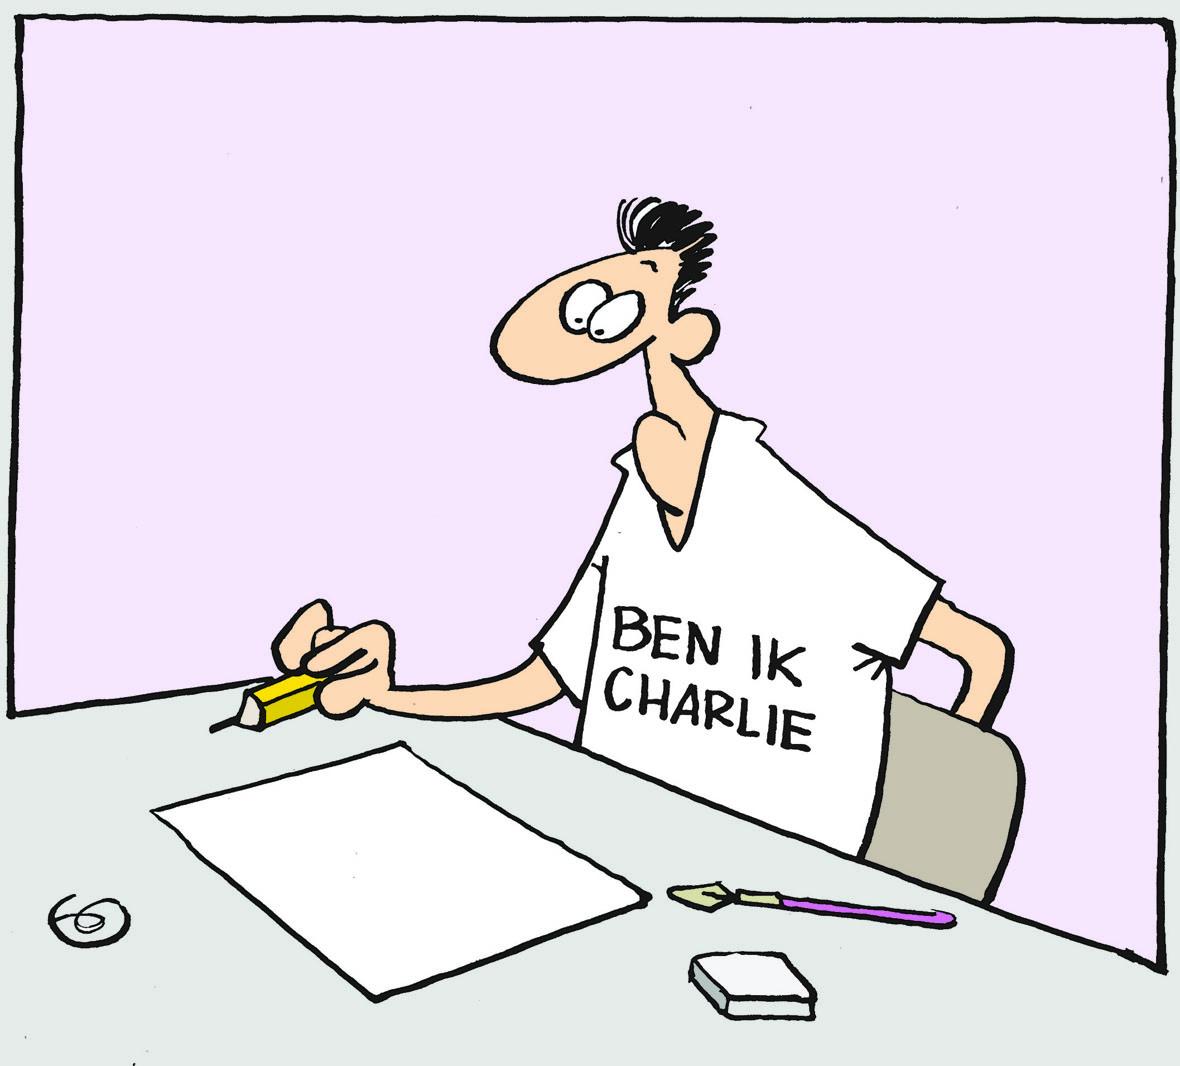 cartoon de jager npo 22 jan 15 blogversie